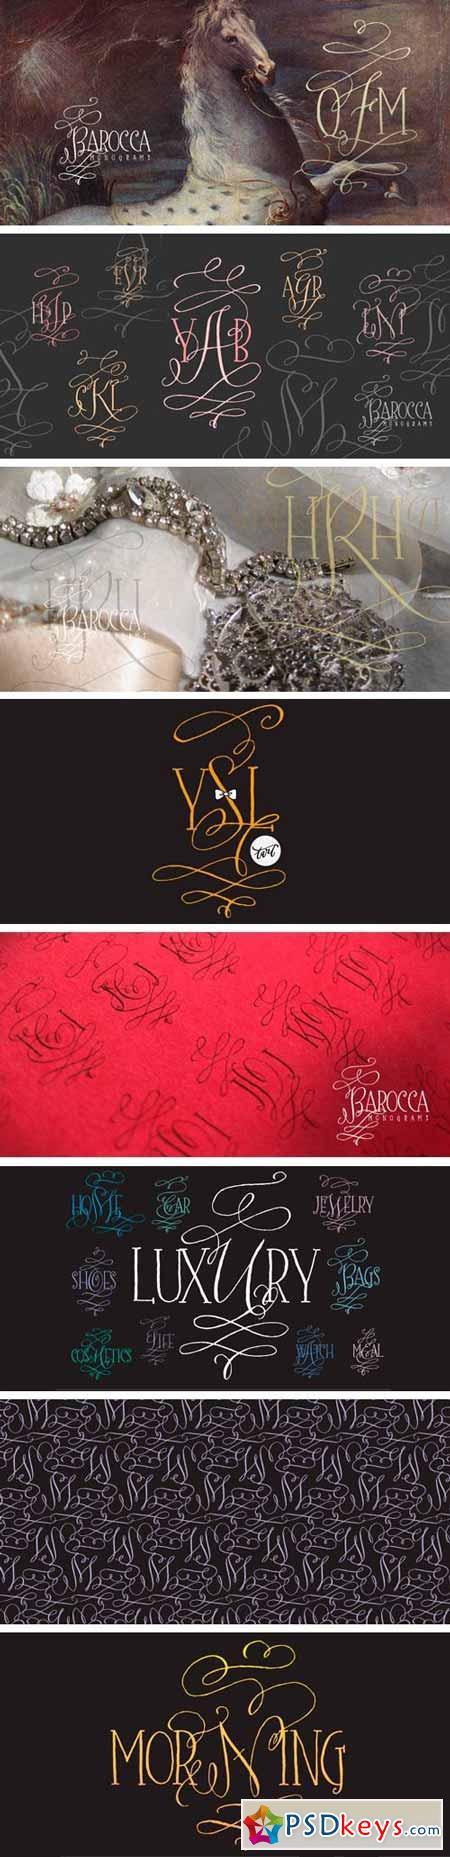 Barocca Monograms Font $30